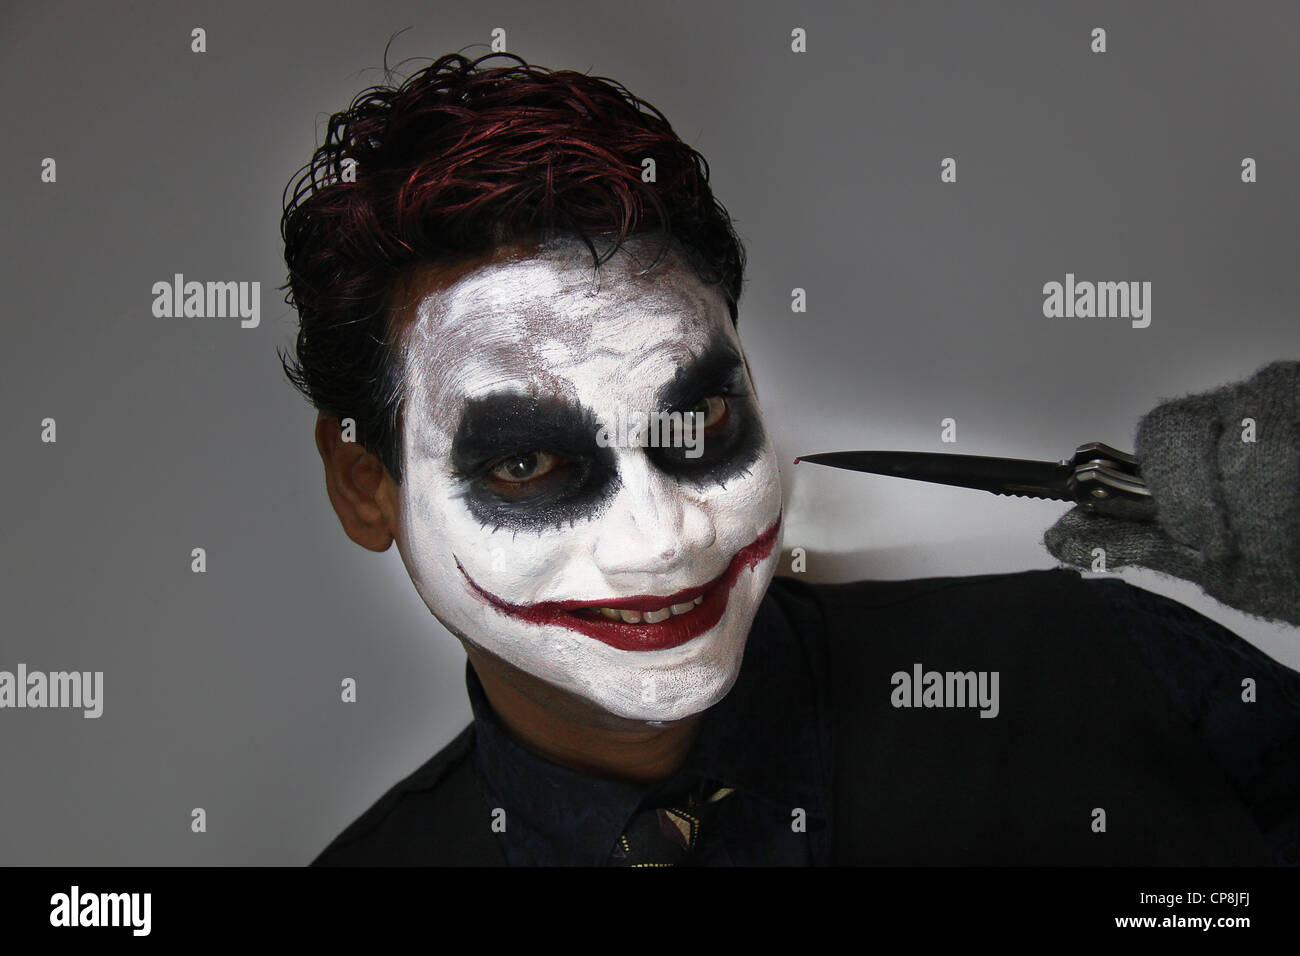 batman joker halloween makeup stock photo: 48133334 - alamy